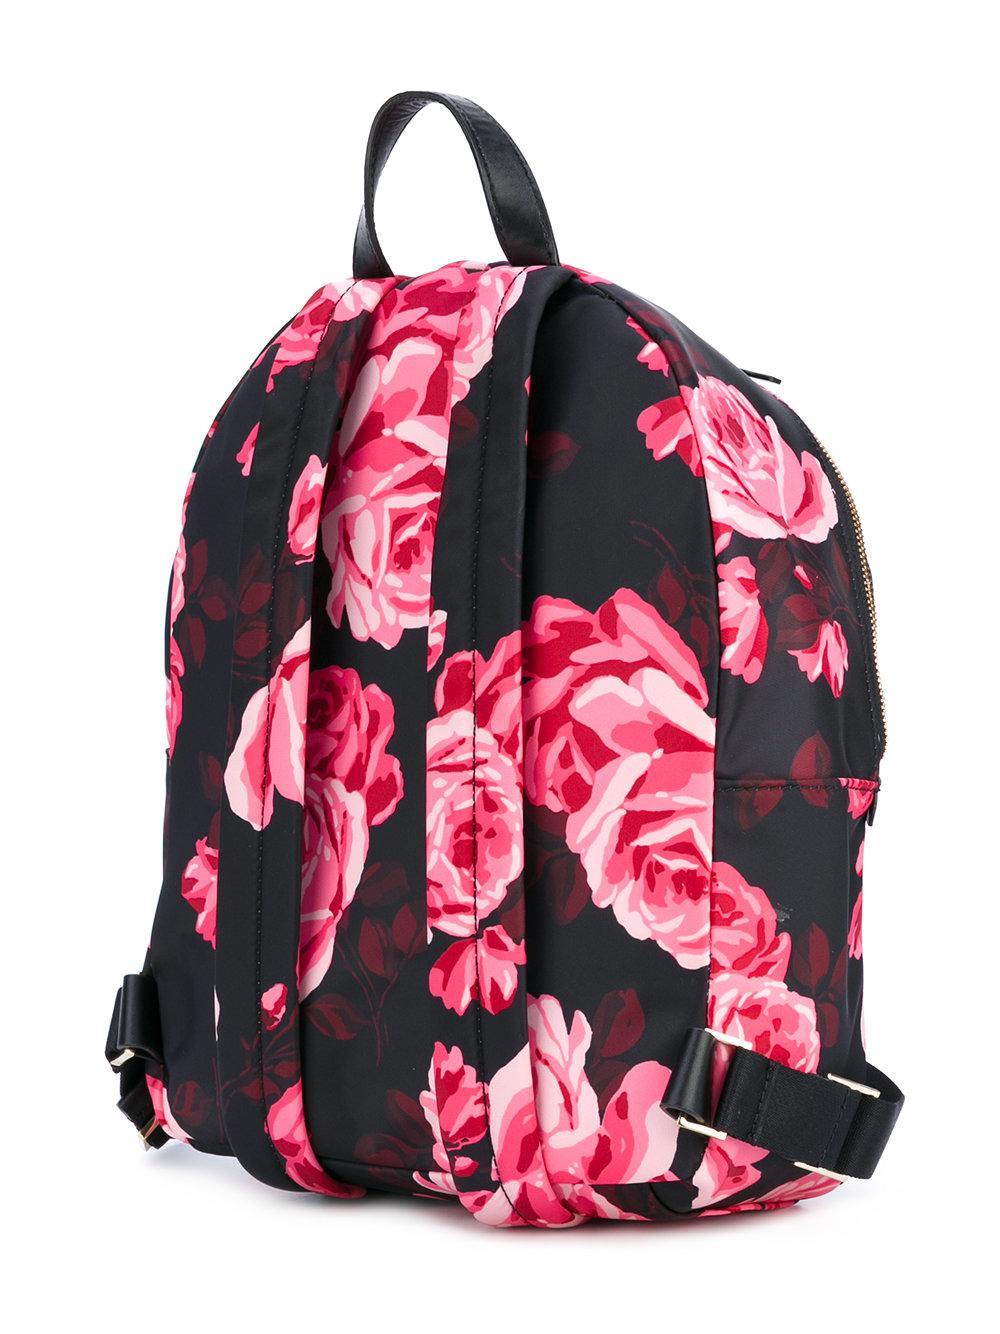 Lyst Kate Spade New York Floral Print Backpack In Black